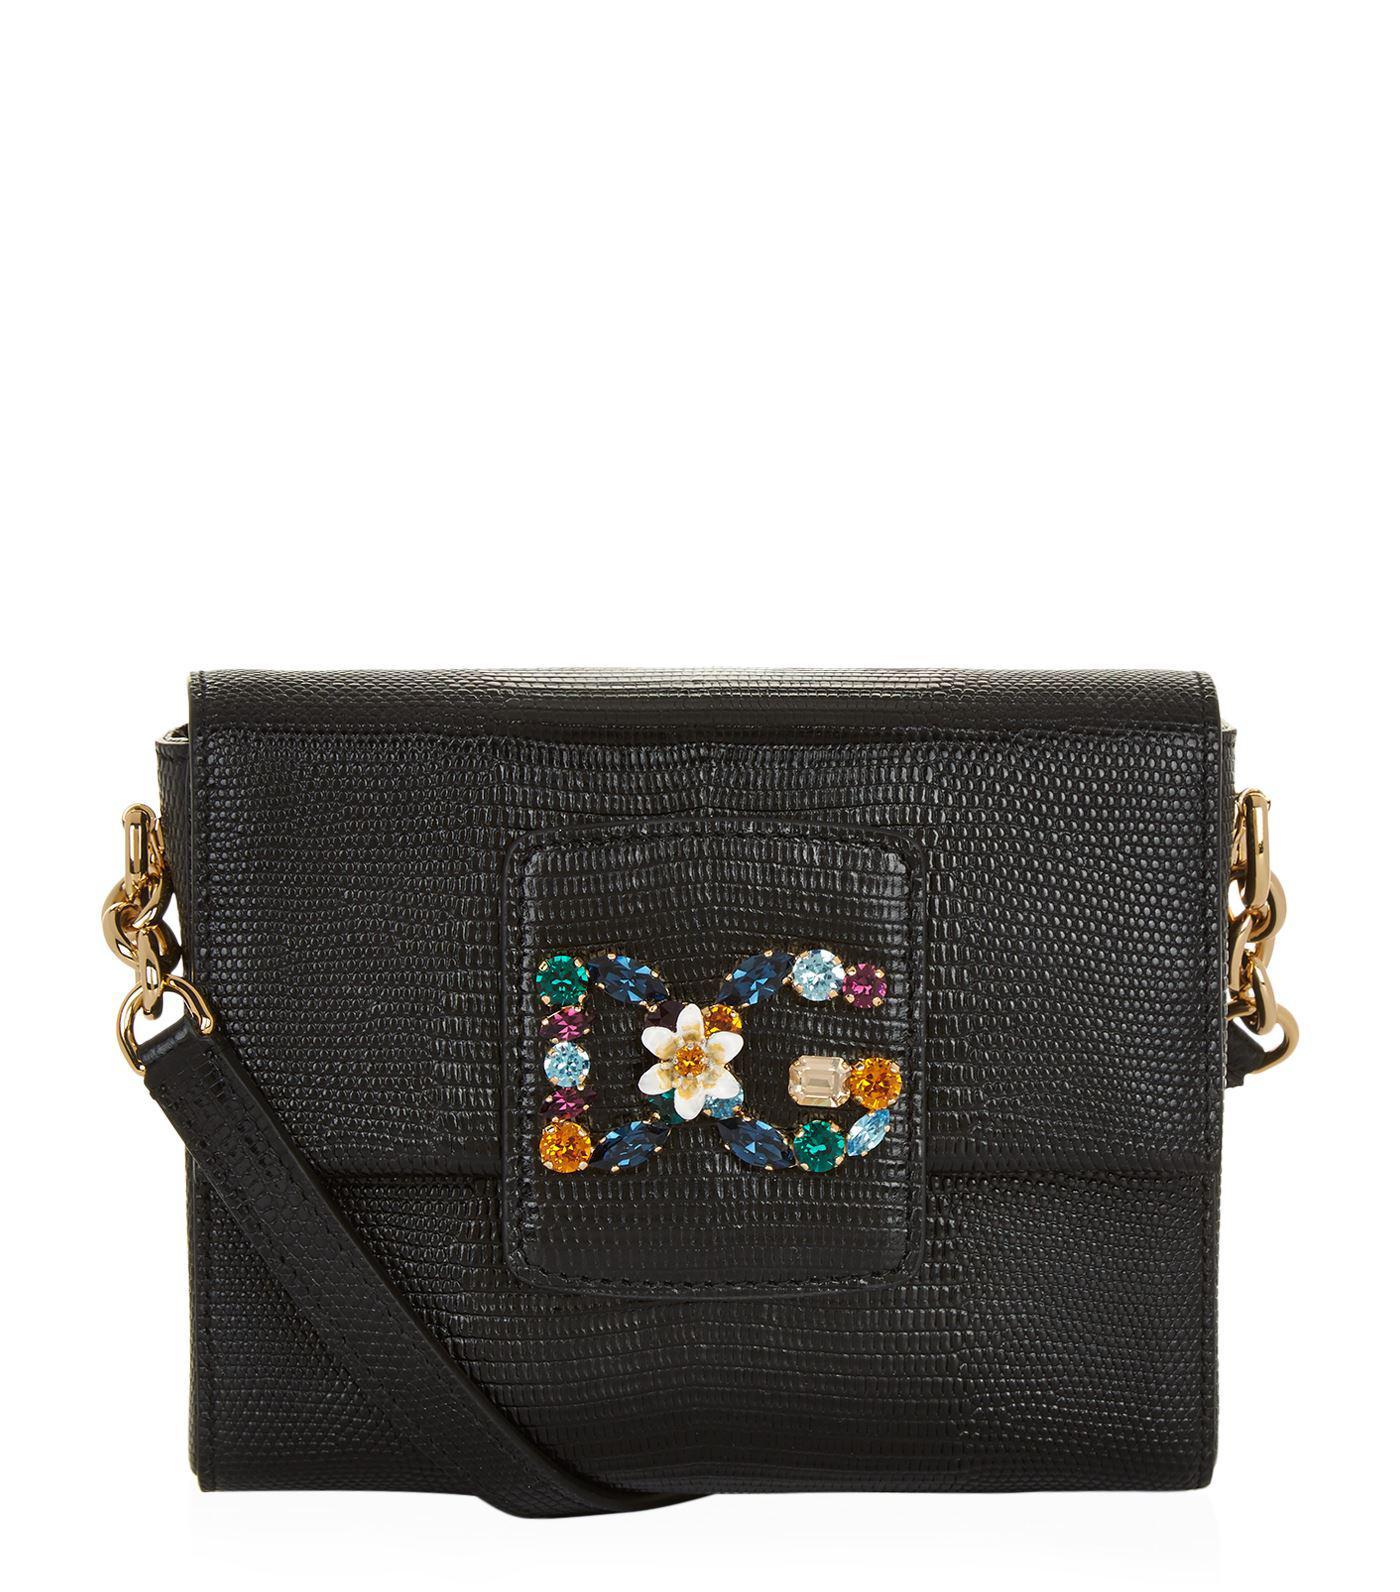 DG crossbody bag - Black Dolce & Gabbana f1cNnO